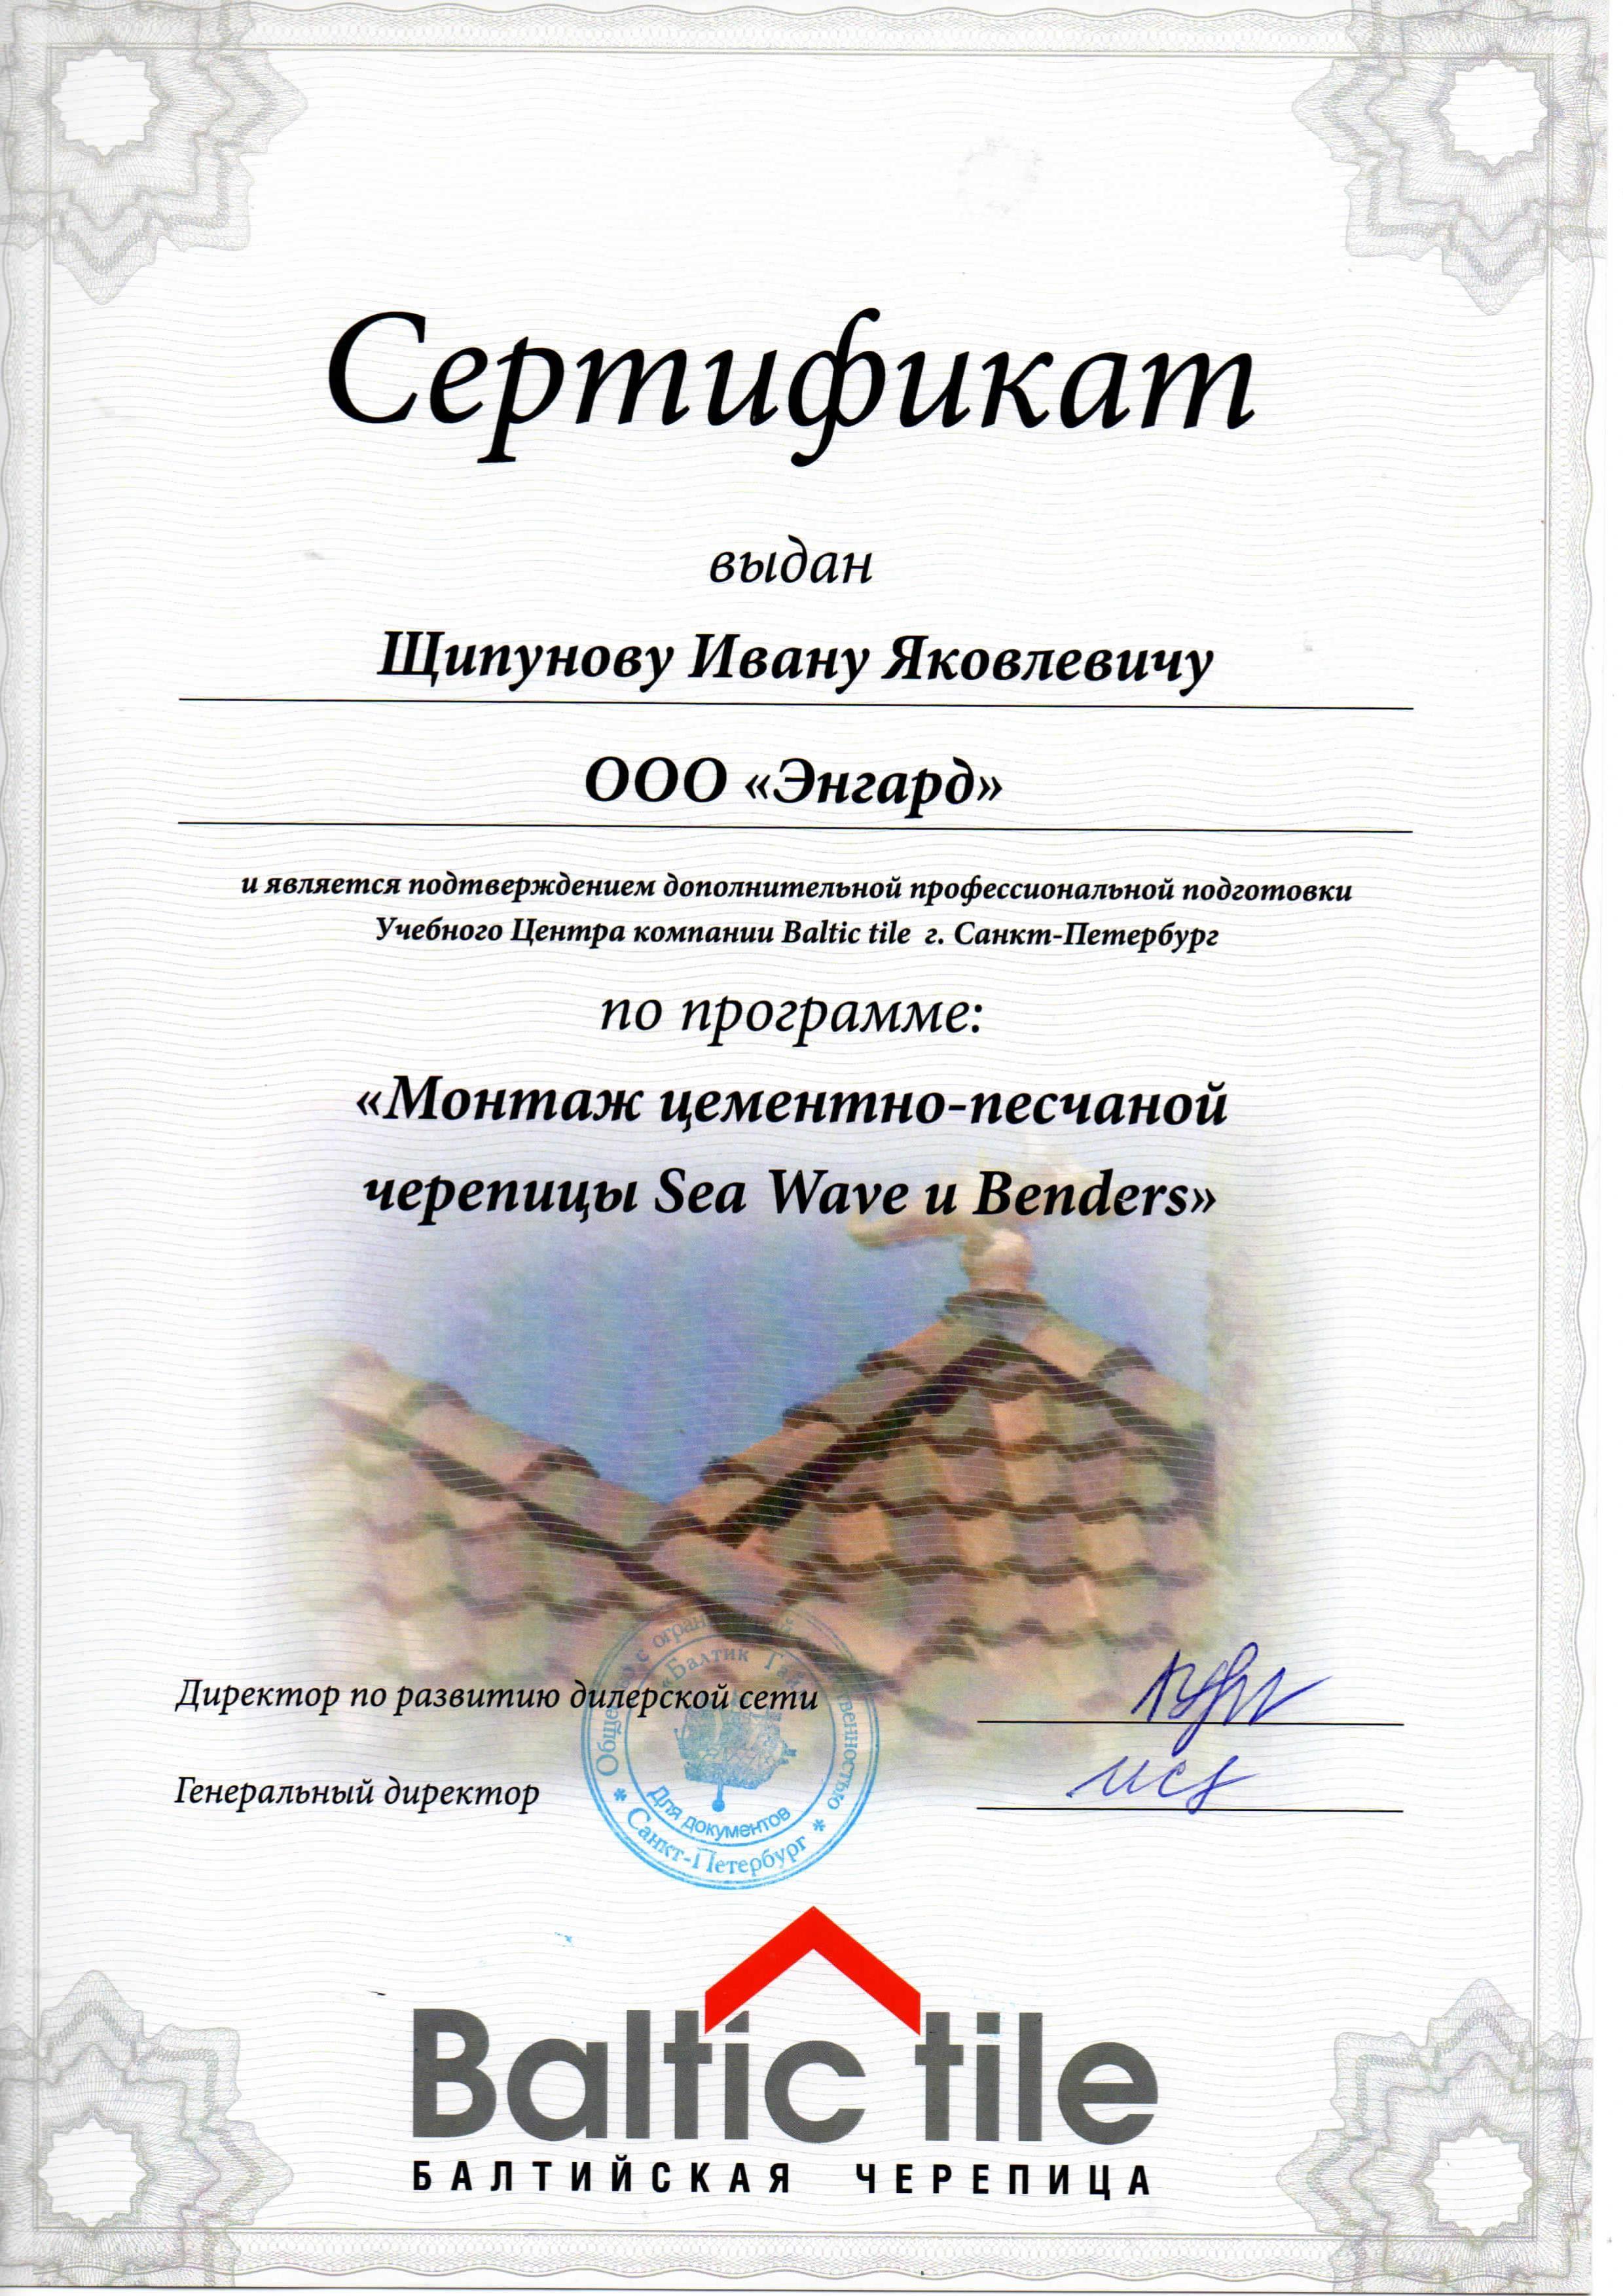 Сертификат Baltic Tile